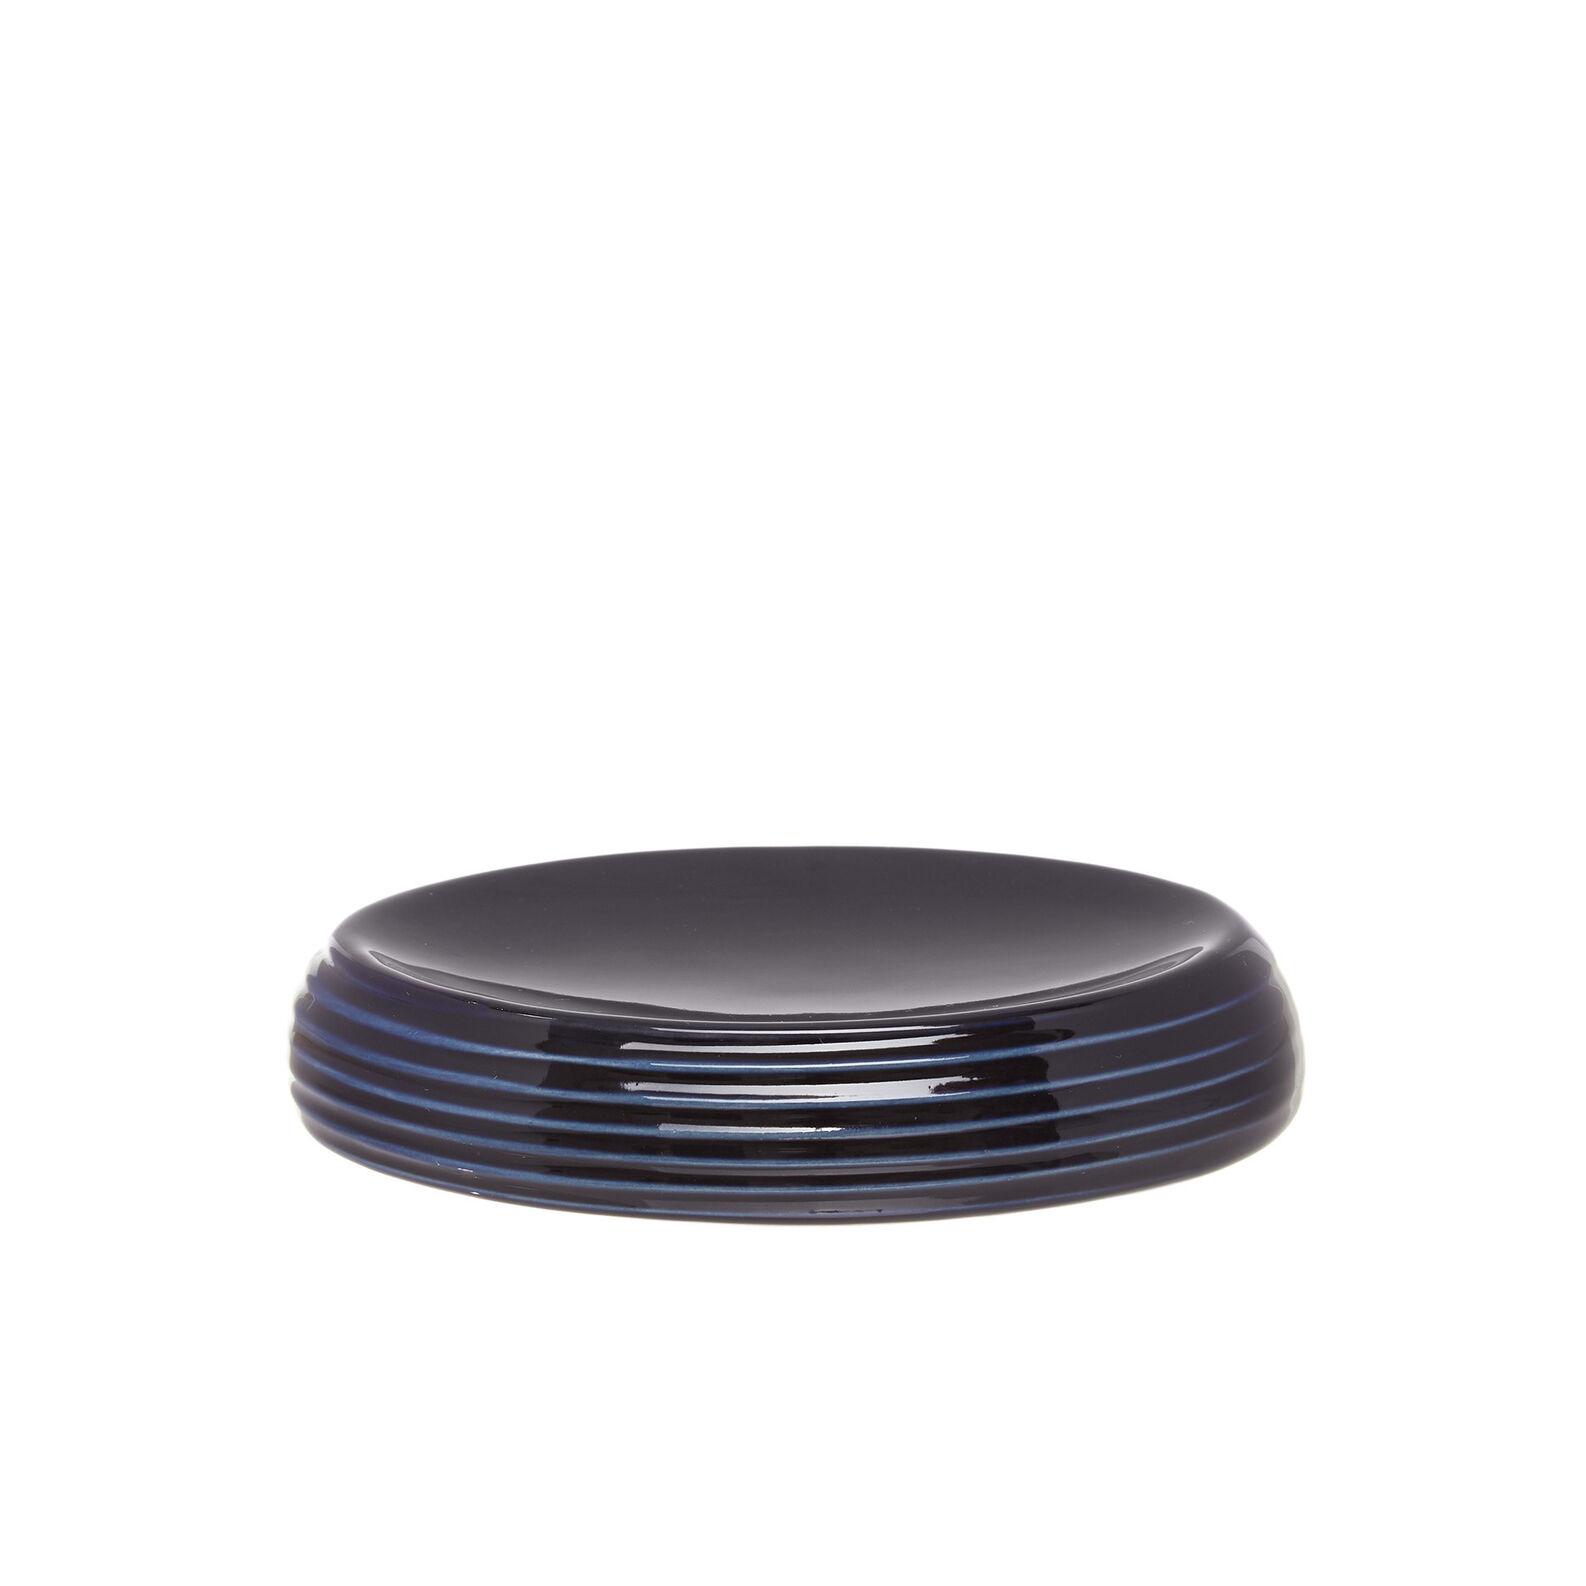 Milled-effect ceramic soap dish.